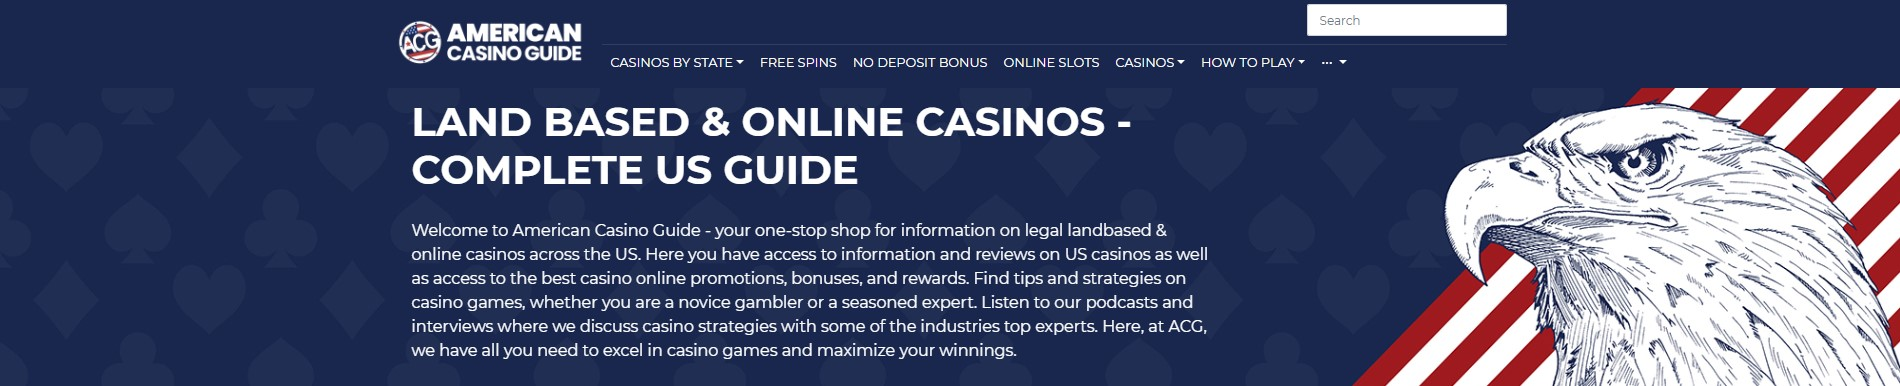 american casino guide affiliate grand slam game lounge